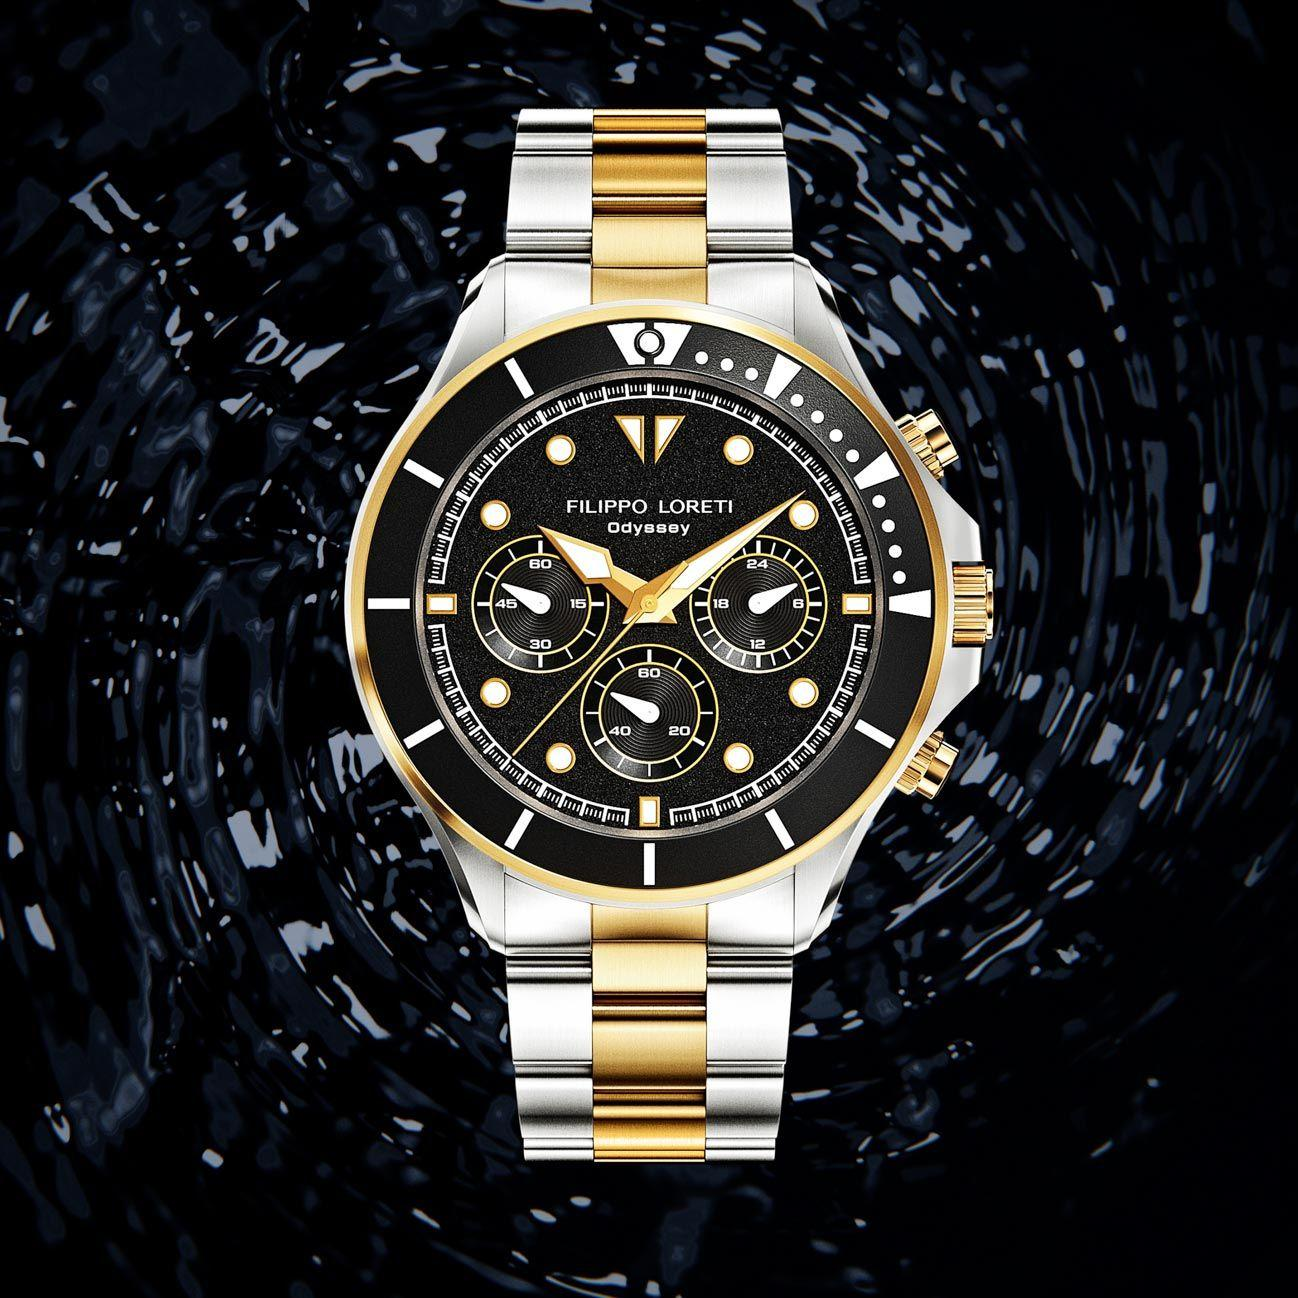 Odyssey Two Tone Rose Gold Steel Men's Watch from Filippo Loreti